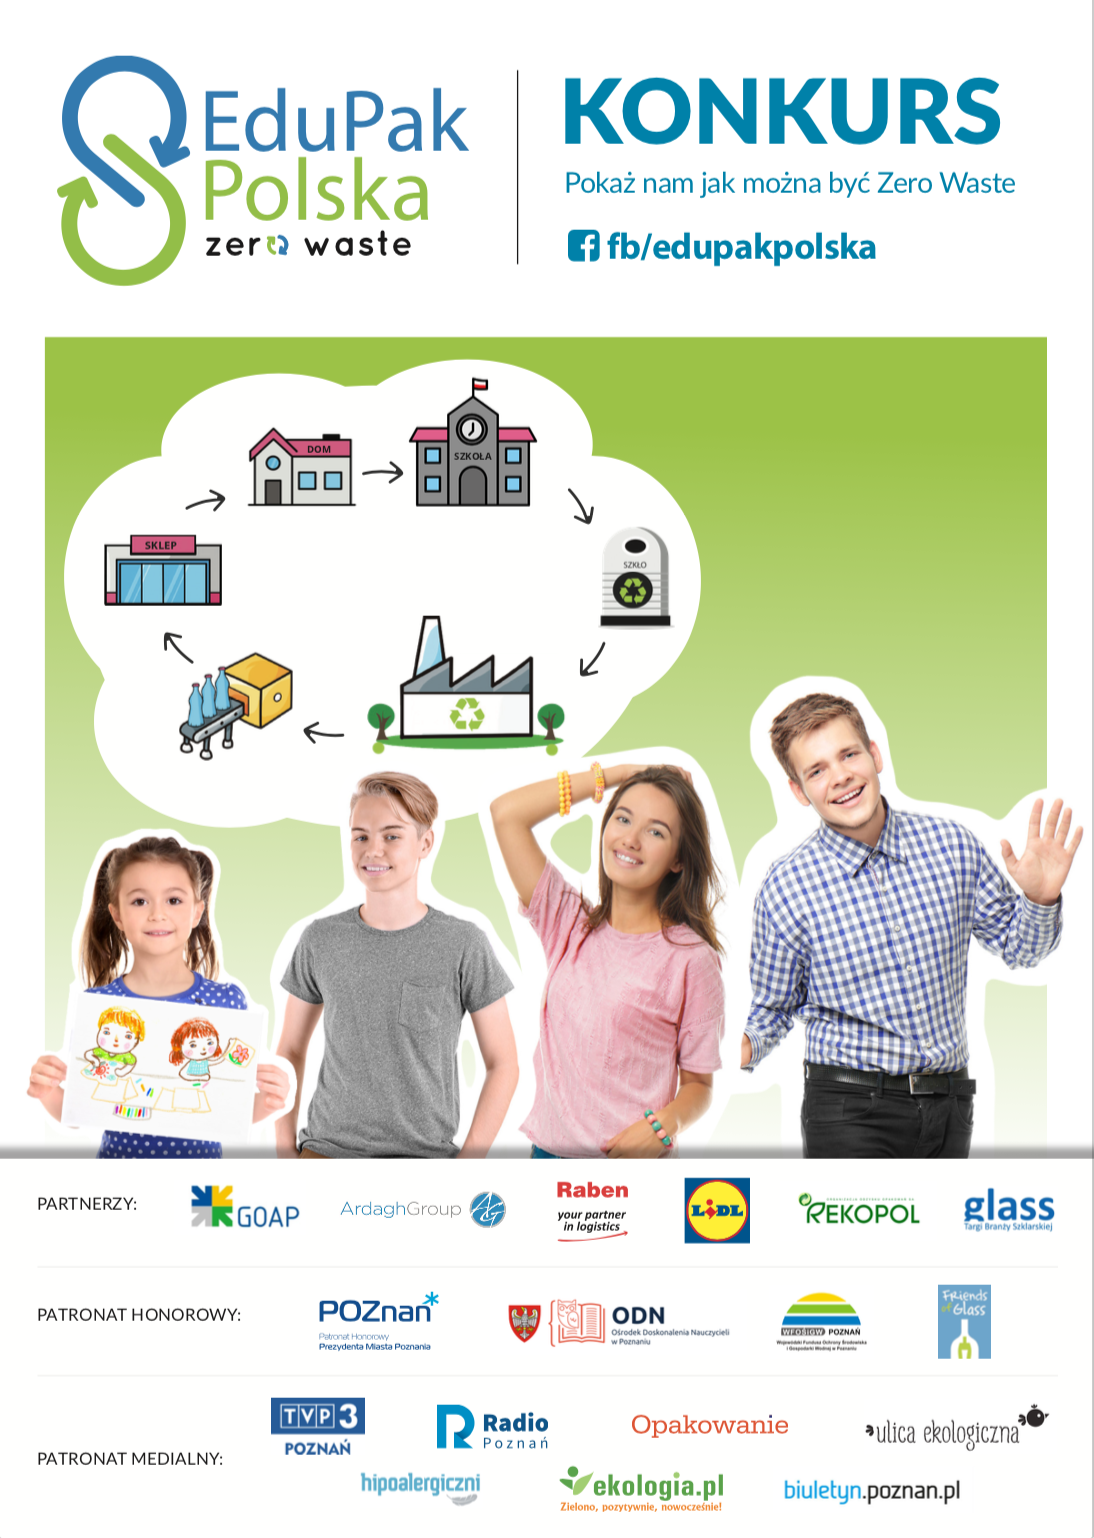 edupak-polska-konkurs-hipoalergiczni-plakat